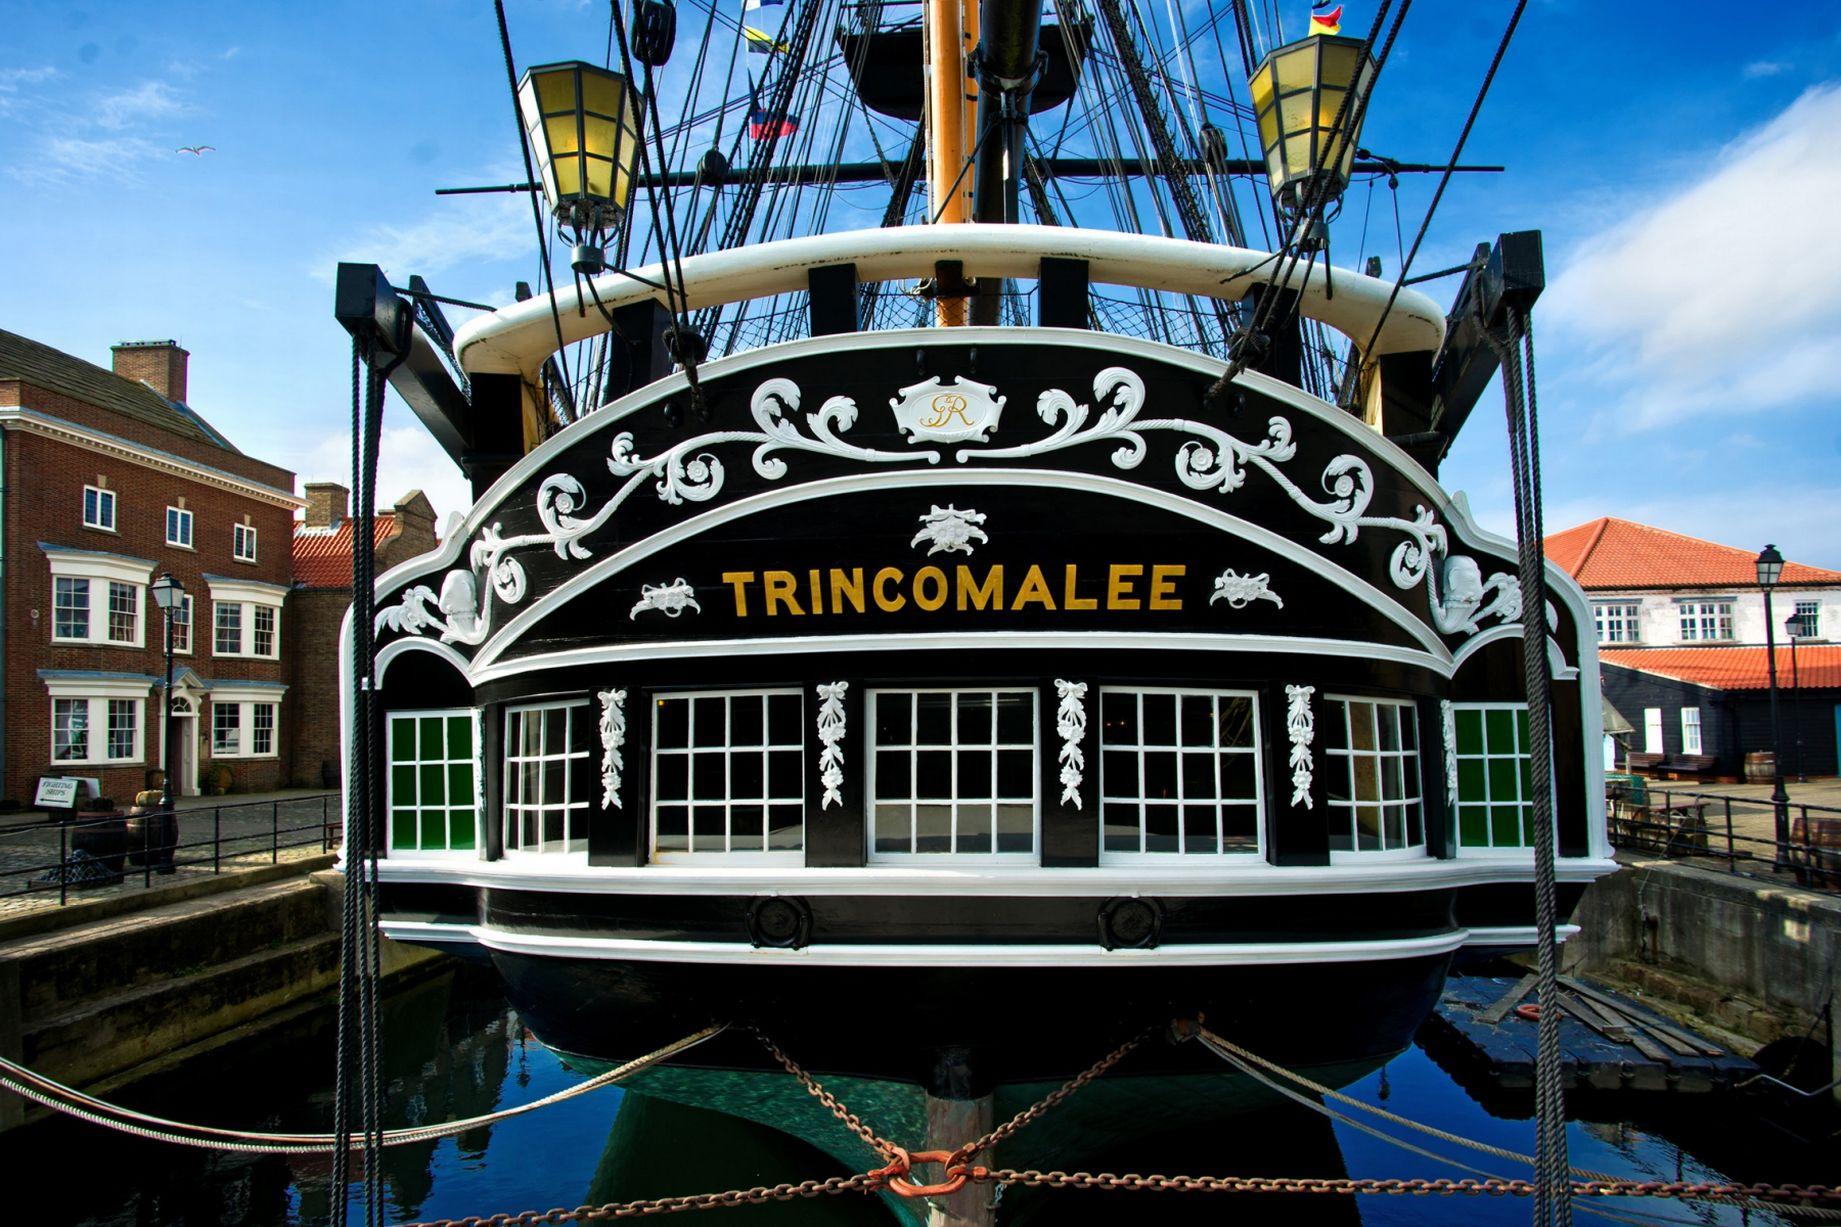 Hms Trincomalee Bicentenary Celebrations Thamarai